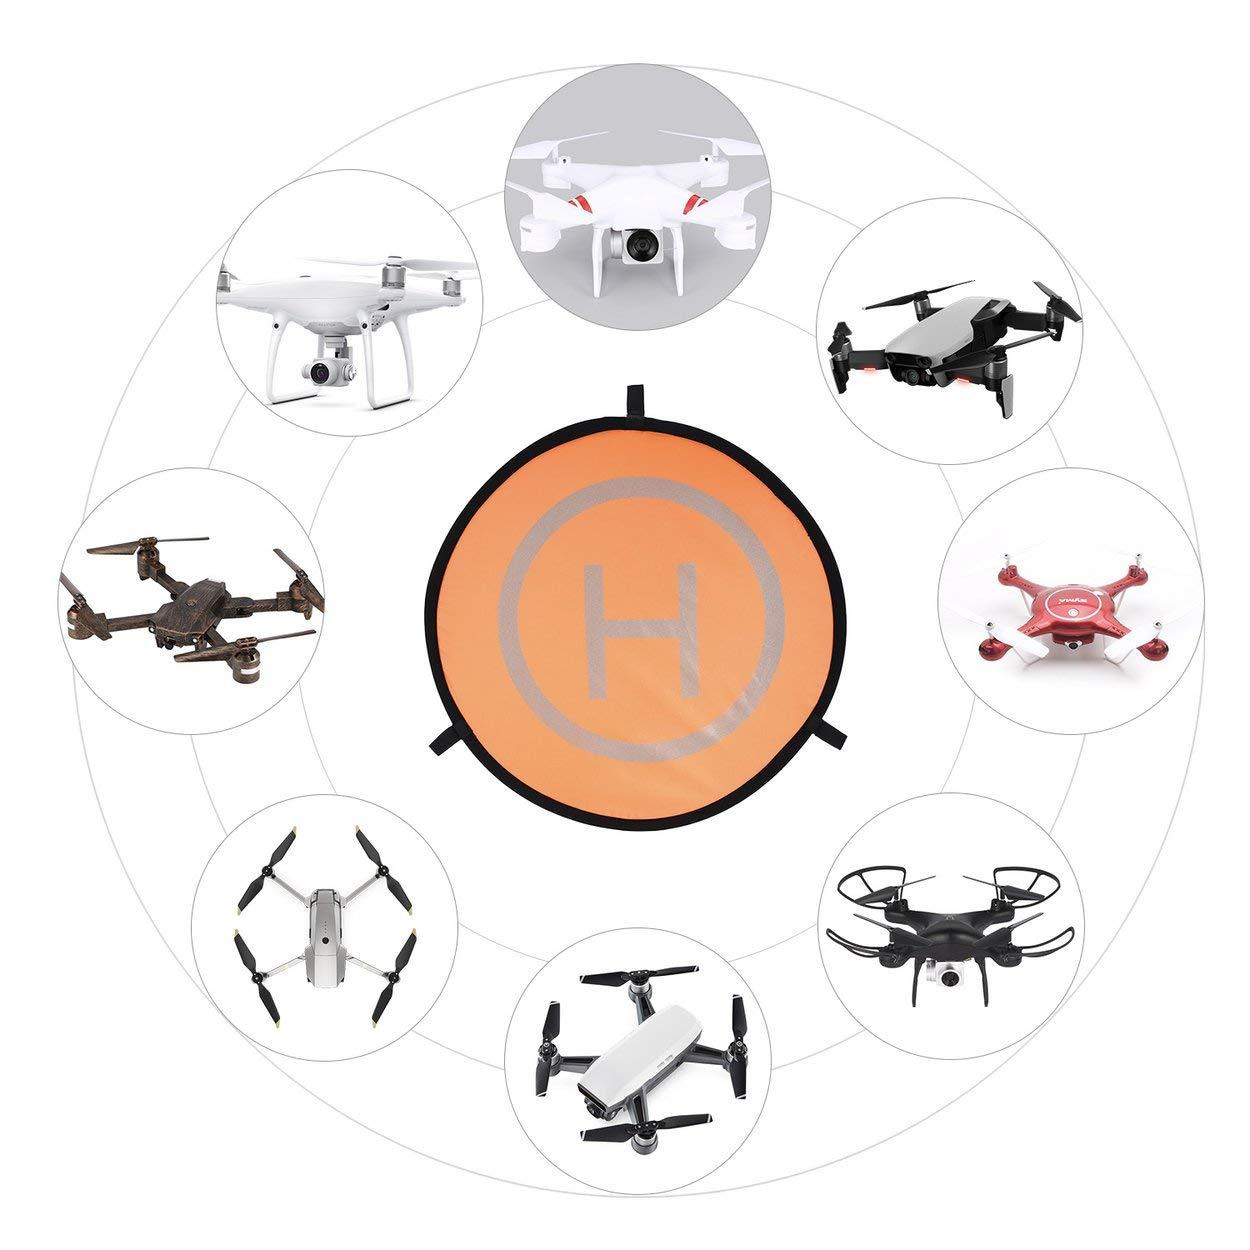 Lorenlli 55 cm Fast-Fold Landing Pad Universal FPV Drone Delantal de estacionamiento Plegable Pad Fit para dji Spark Mavic Pro FPV Racing Drone Accesorio